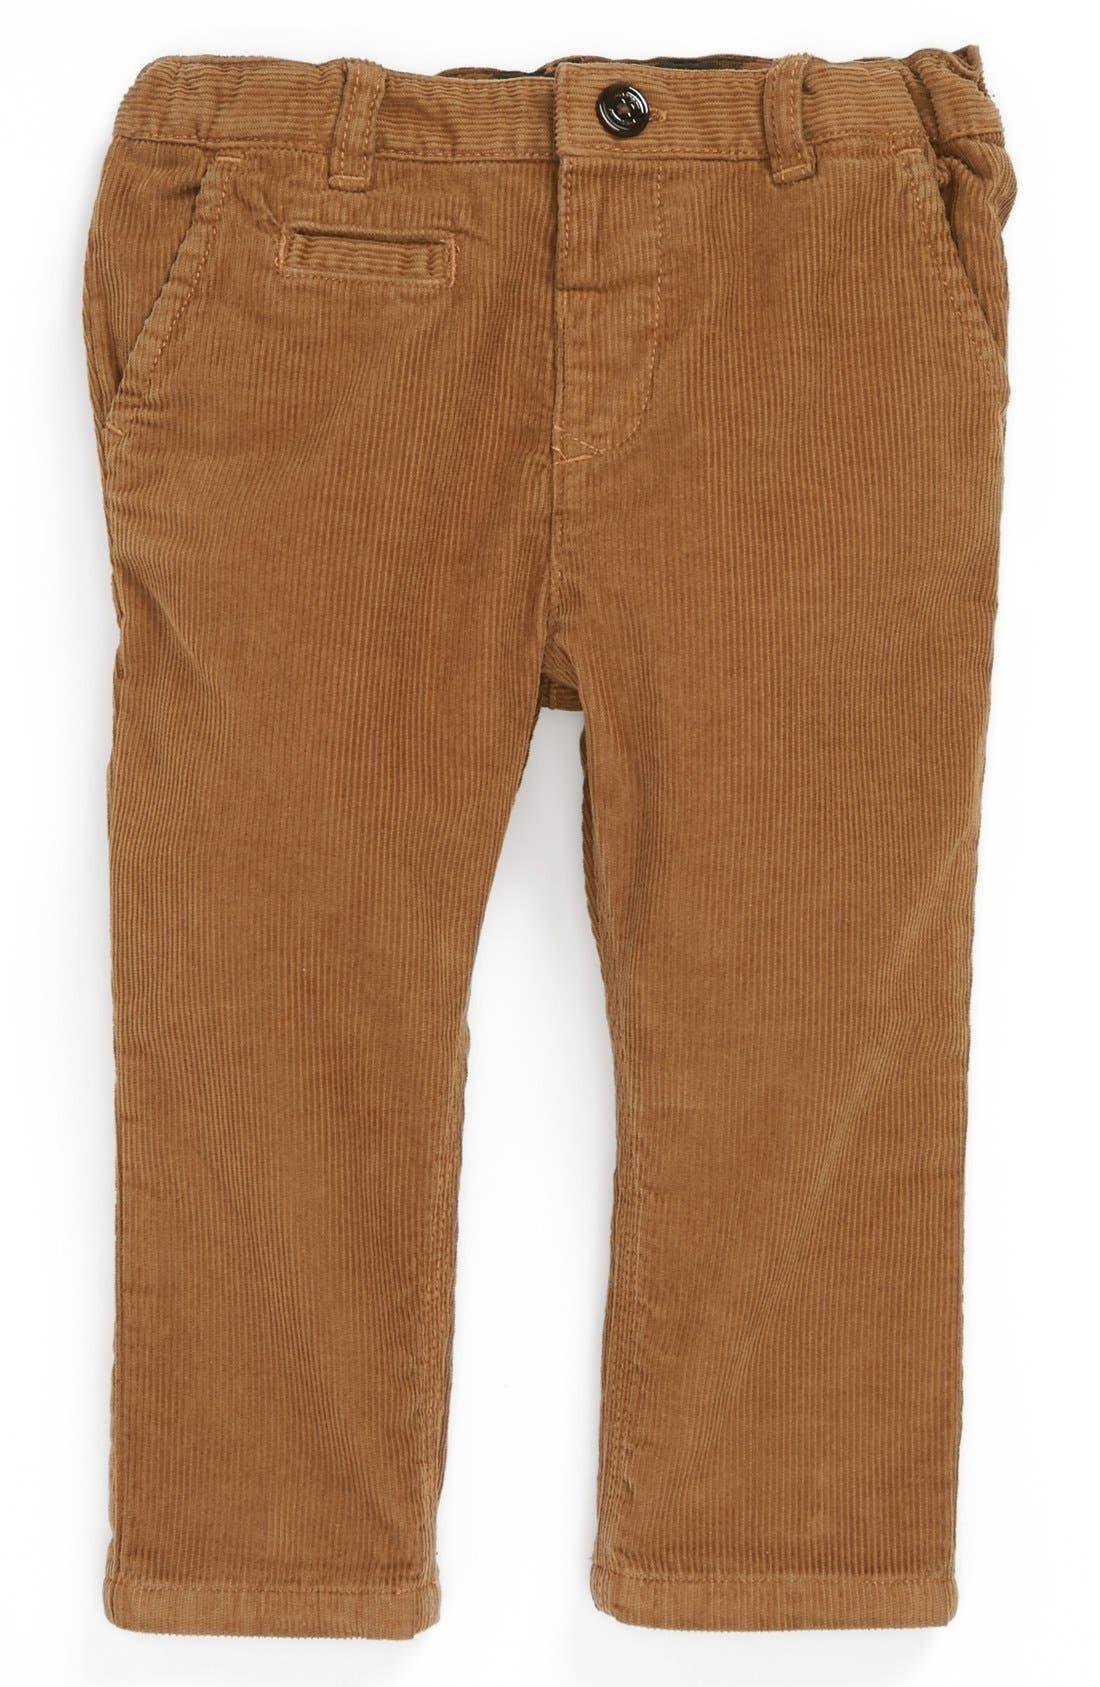 Main Image - Burberry Corduroy Pants (Baby Boys)